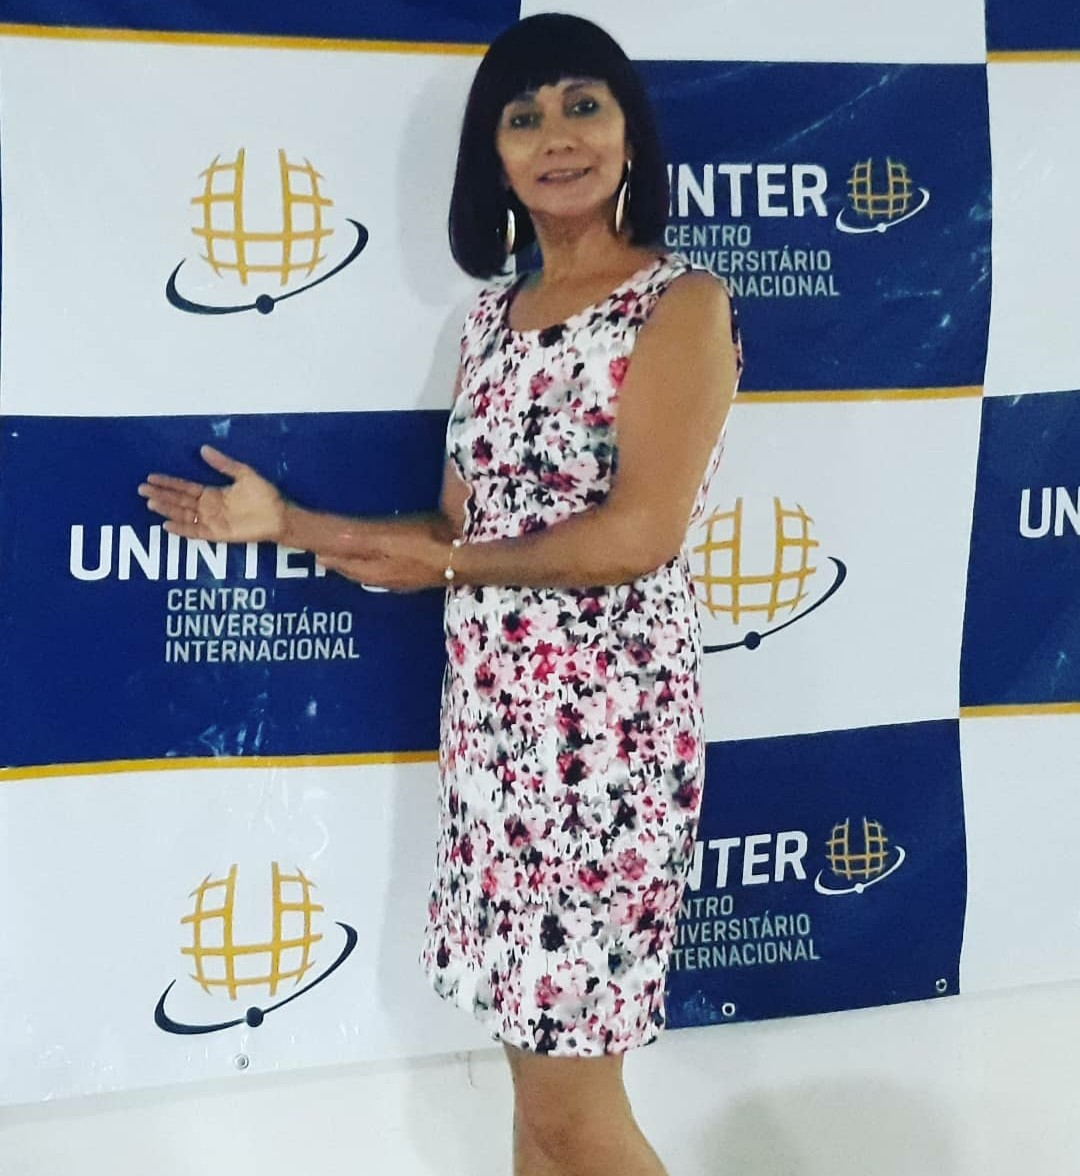 Visita a Uninter